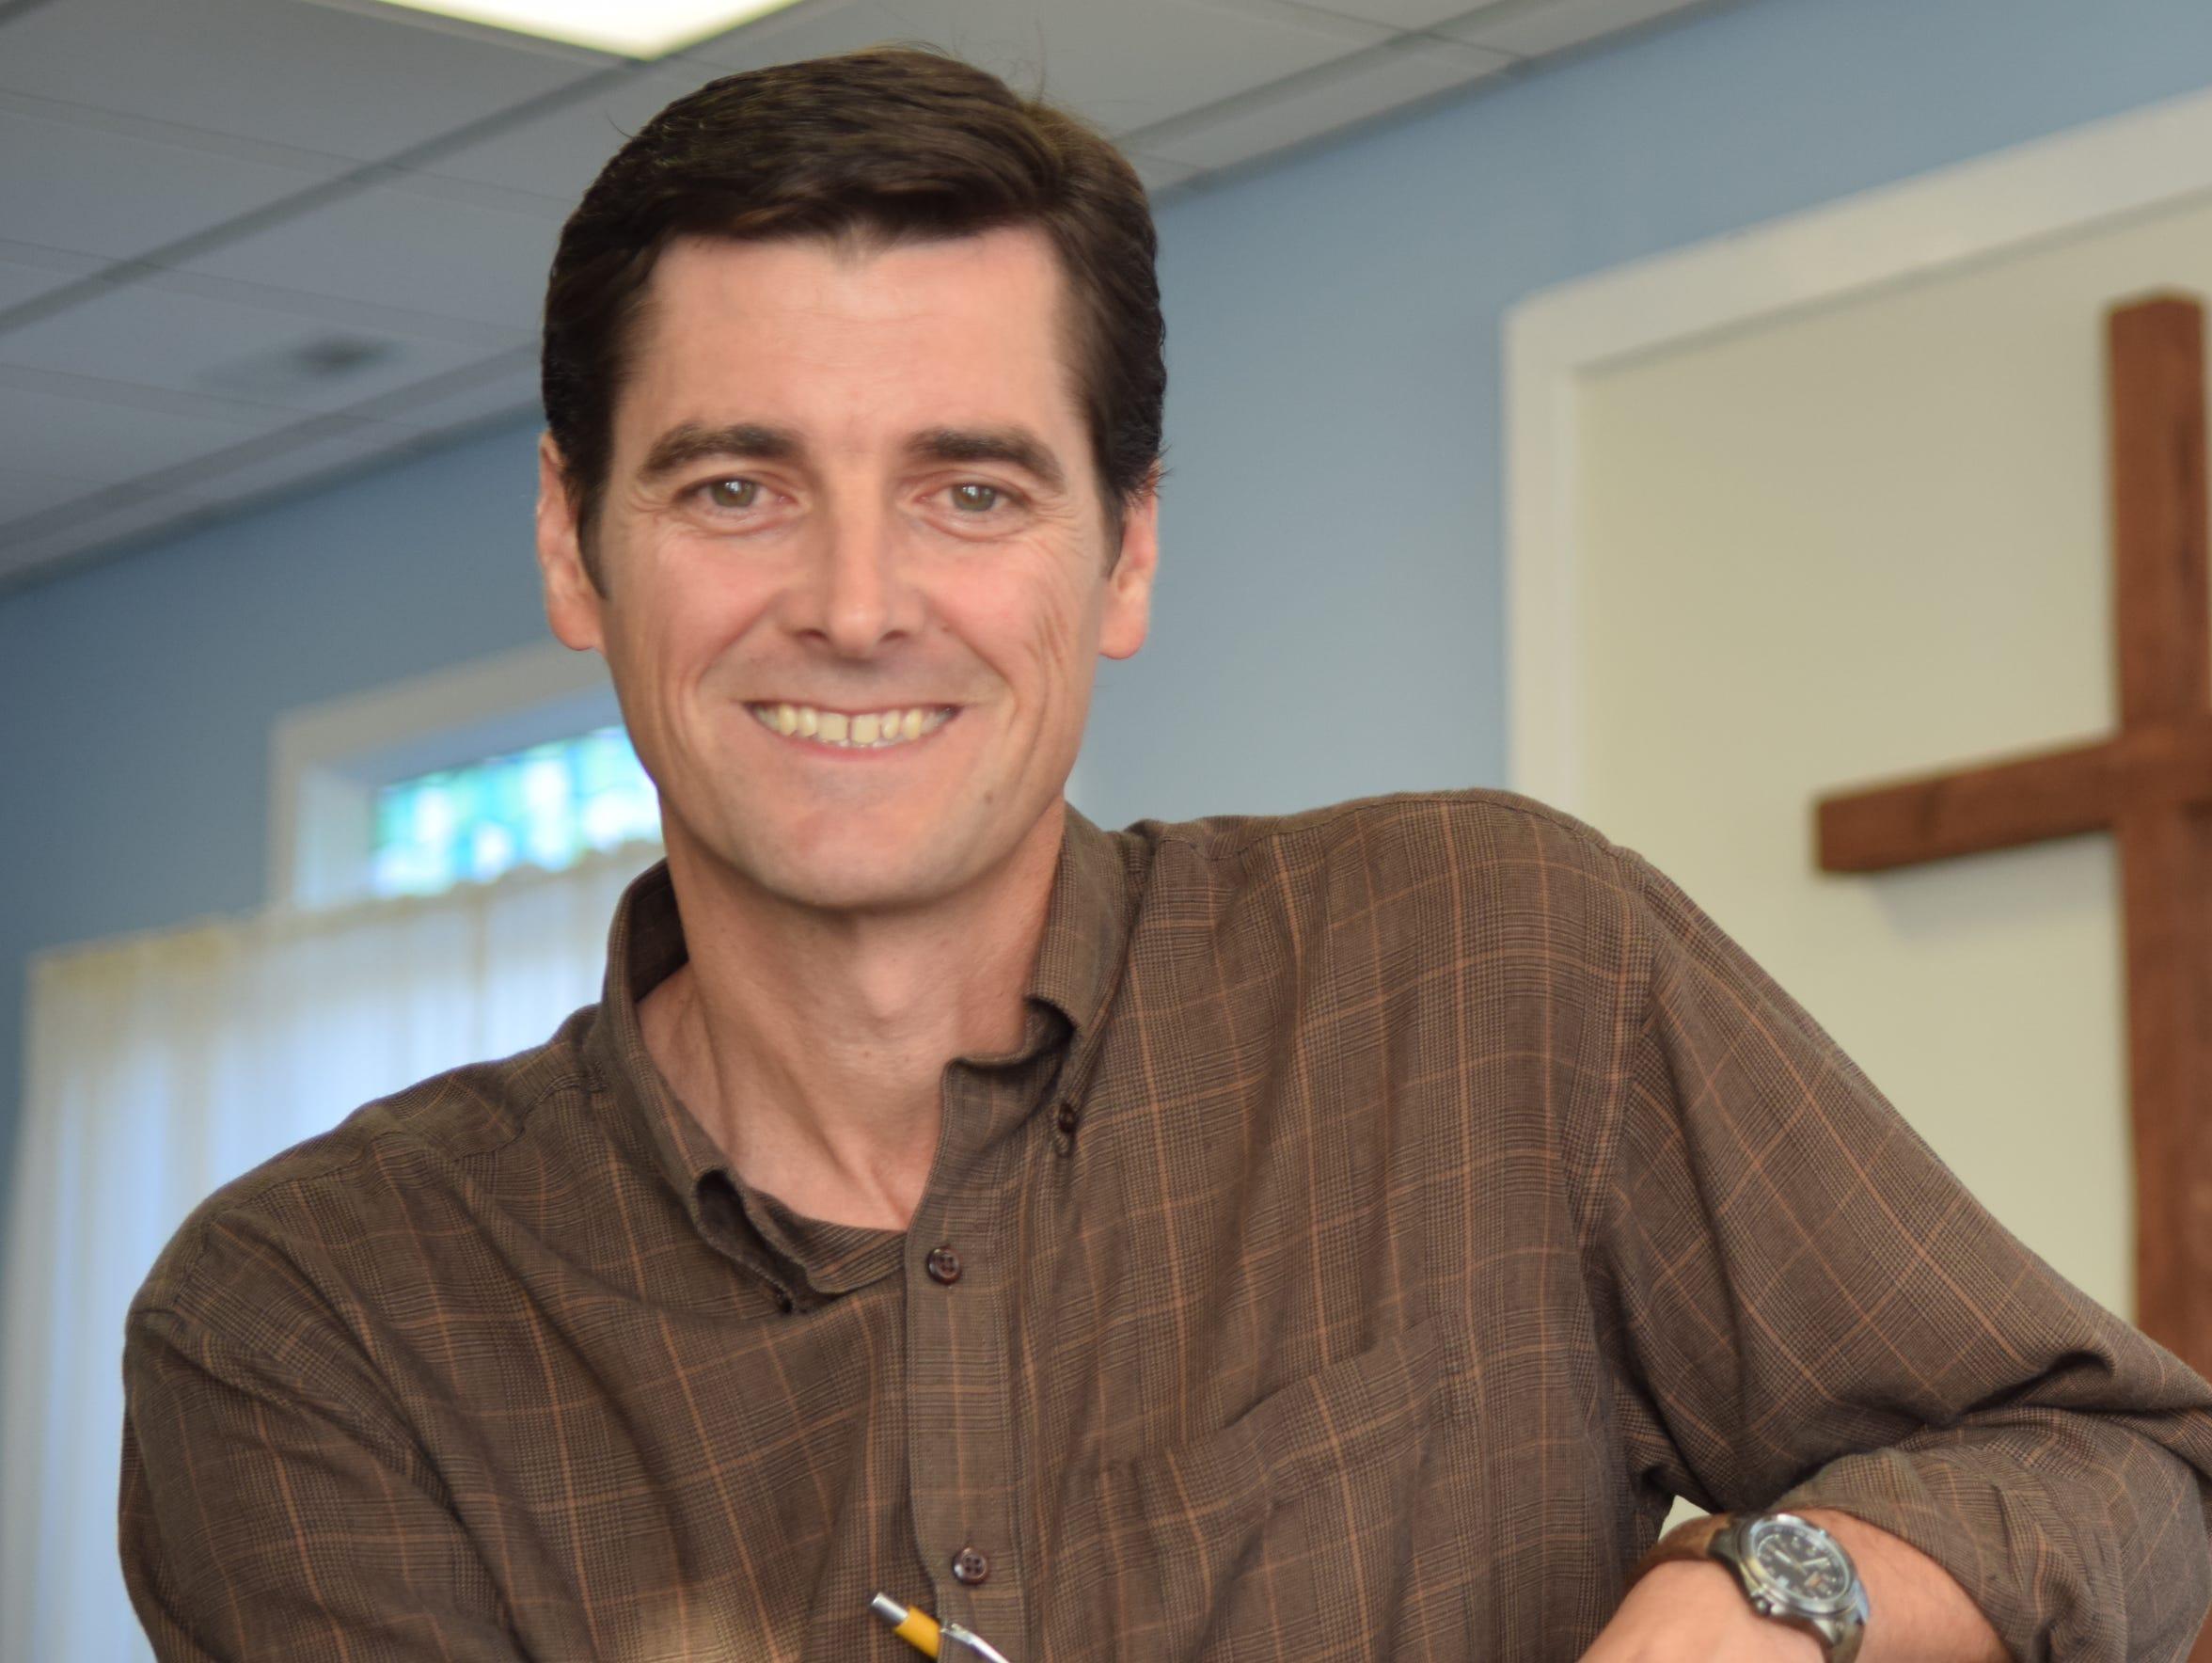 Shaun Fink is seen inside Cornerstone Bible Church,